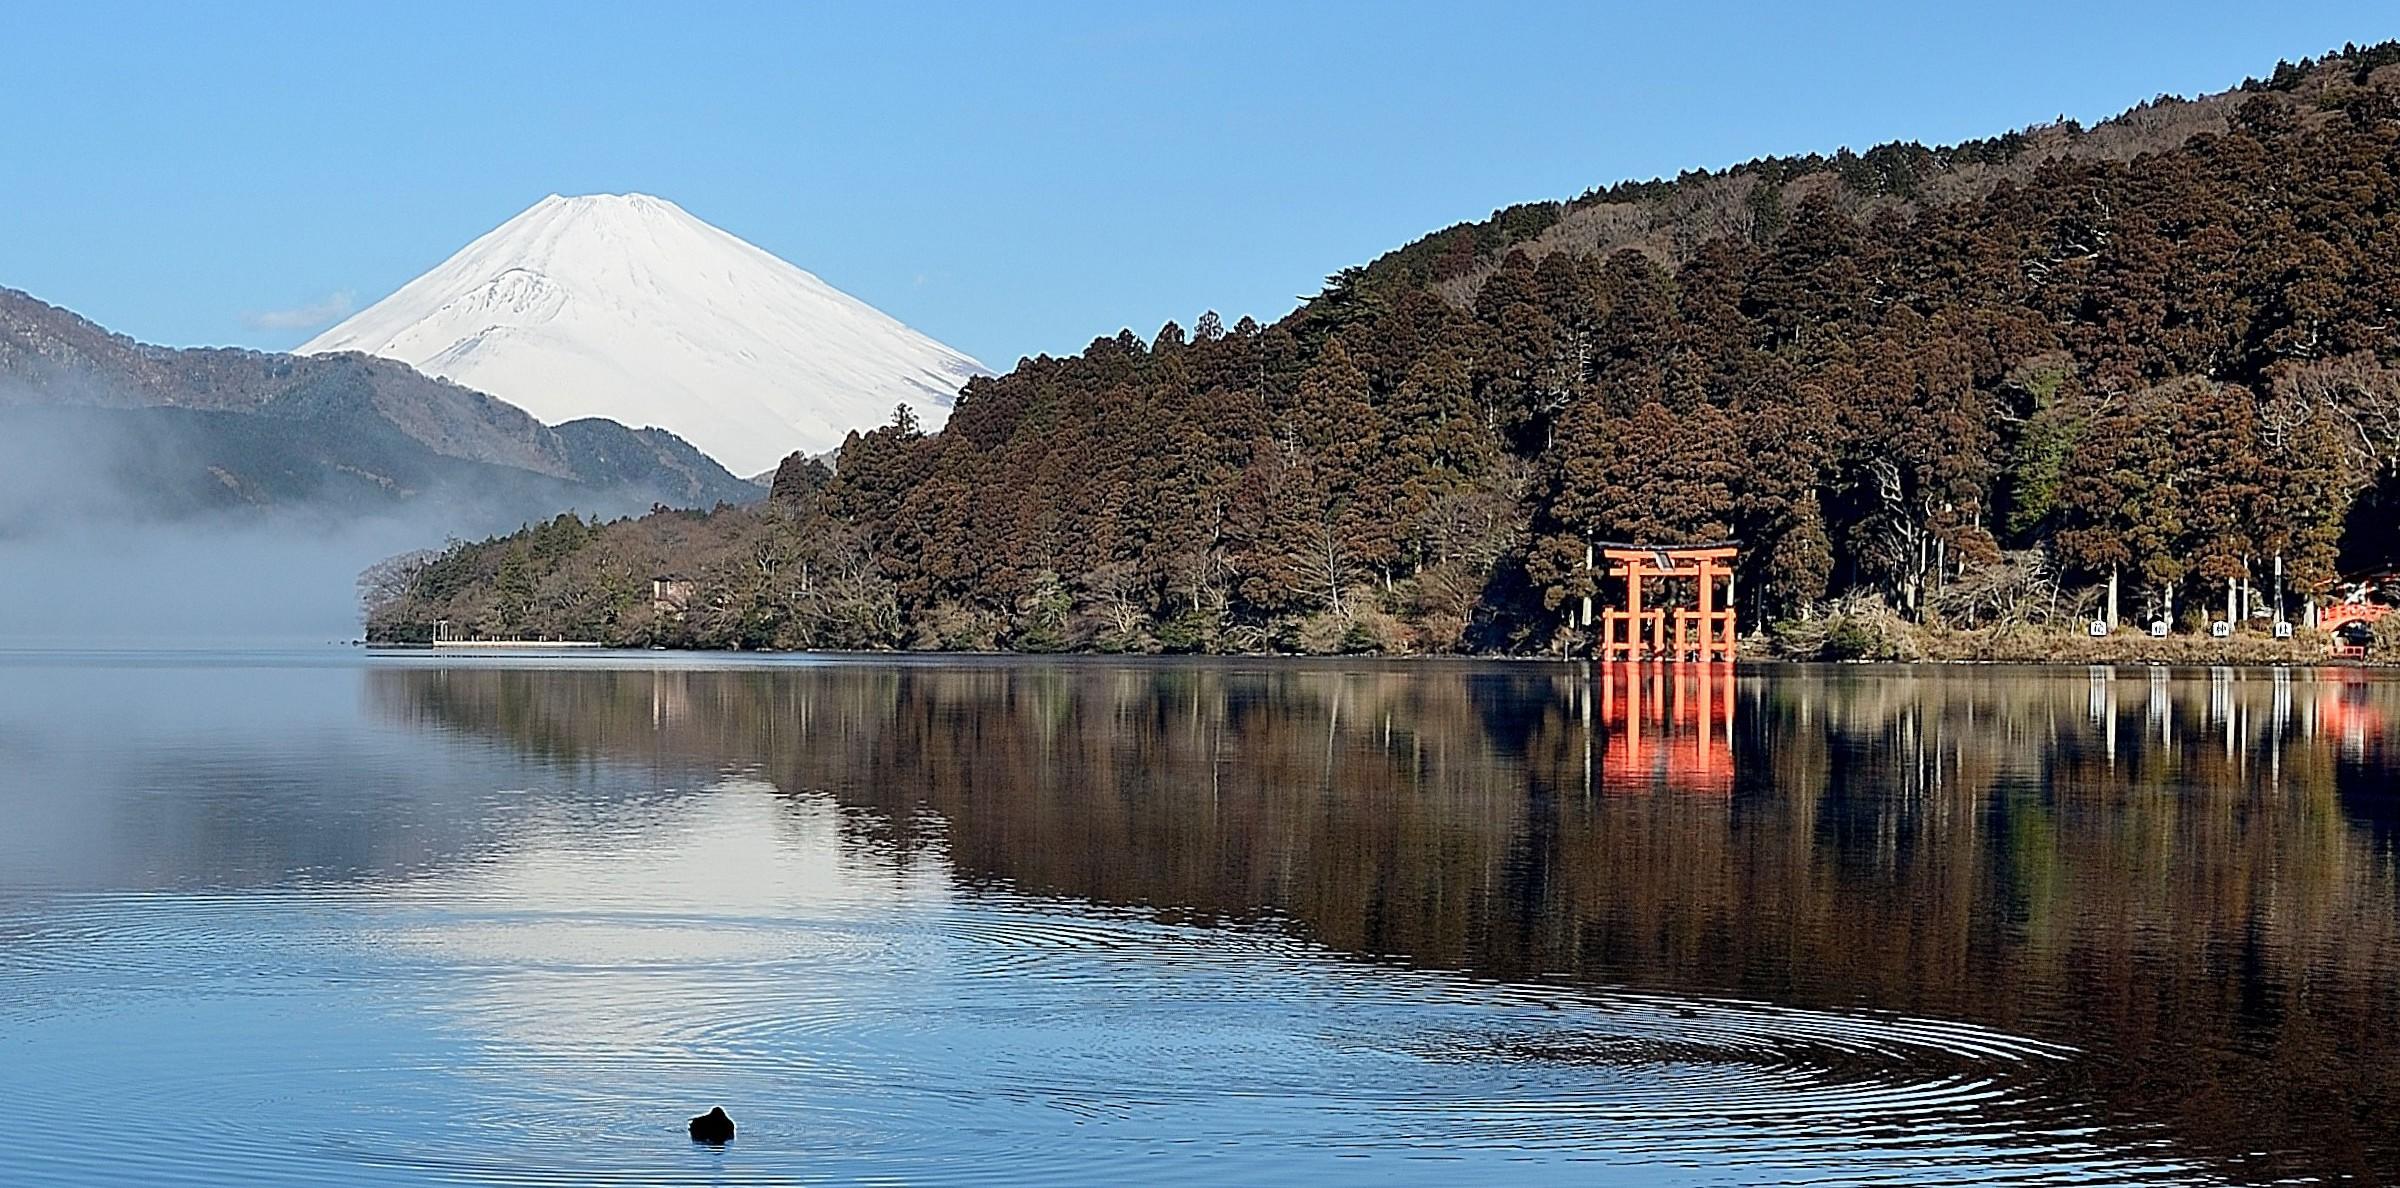 箱根温泉旅館ホテル協同組合